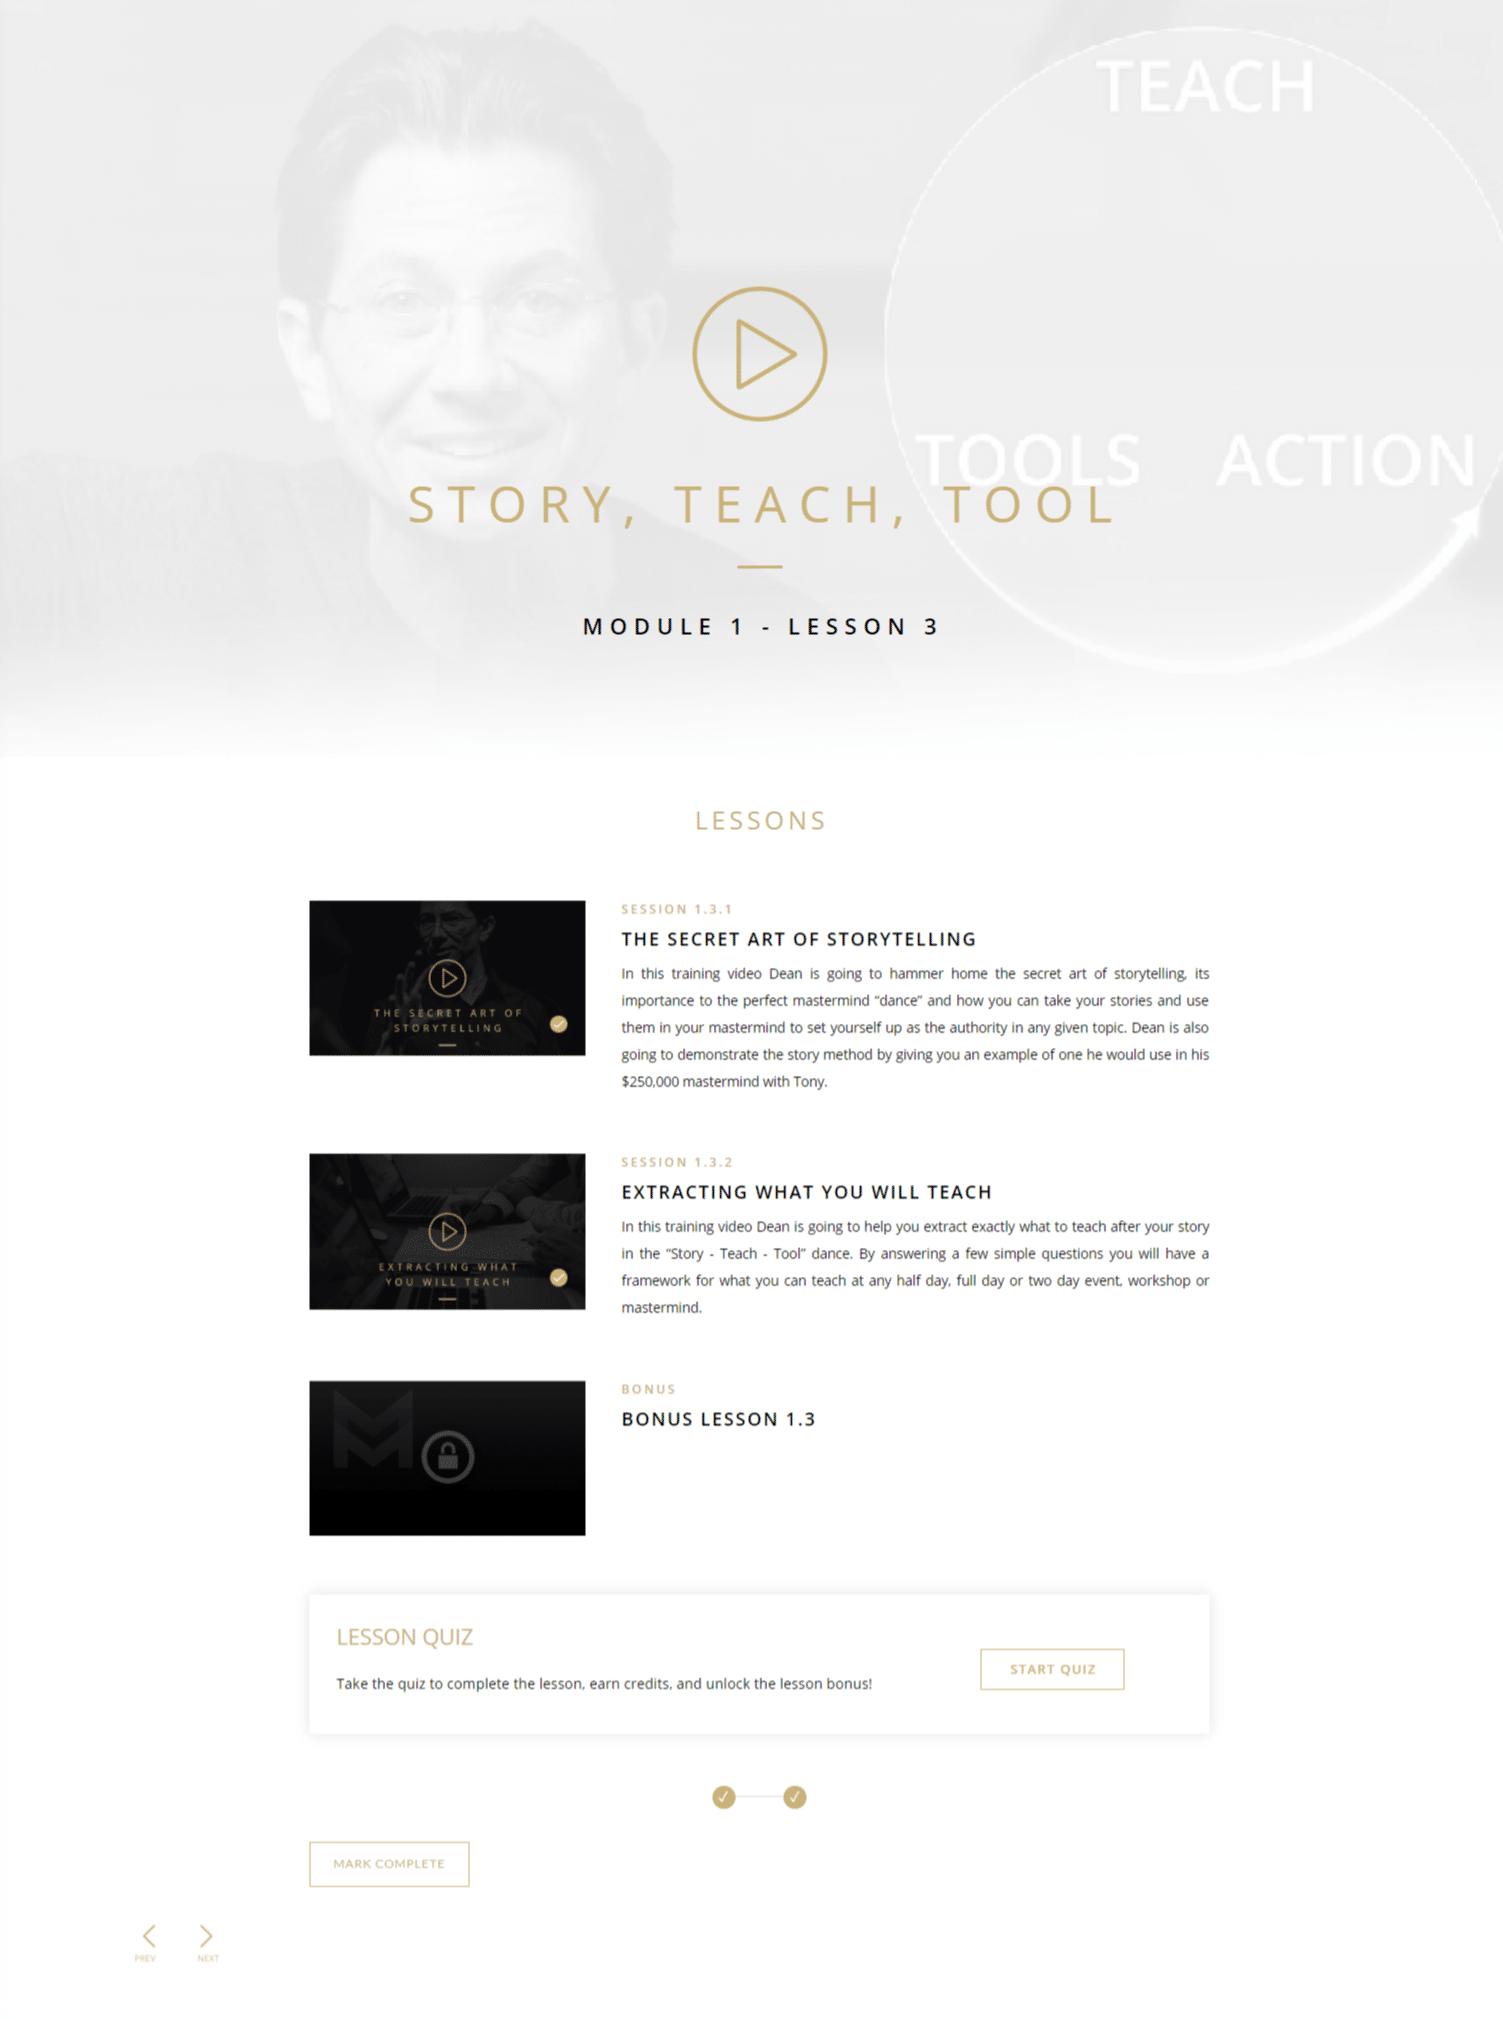 Story Teach Tool - inside the training module